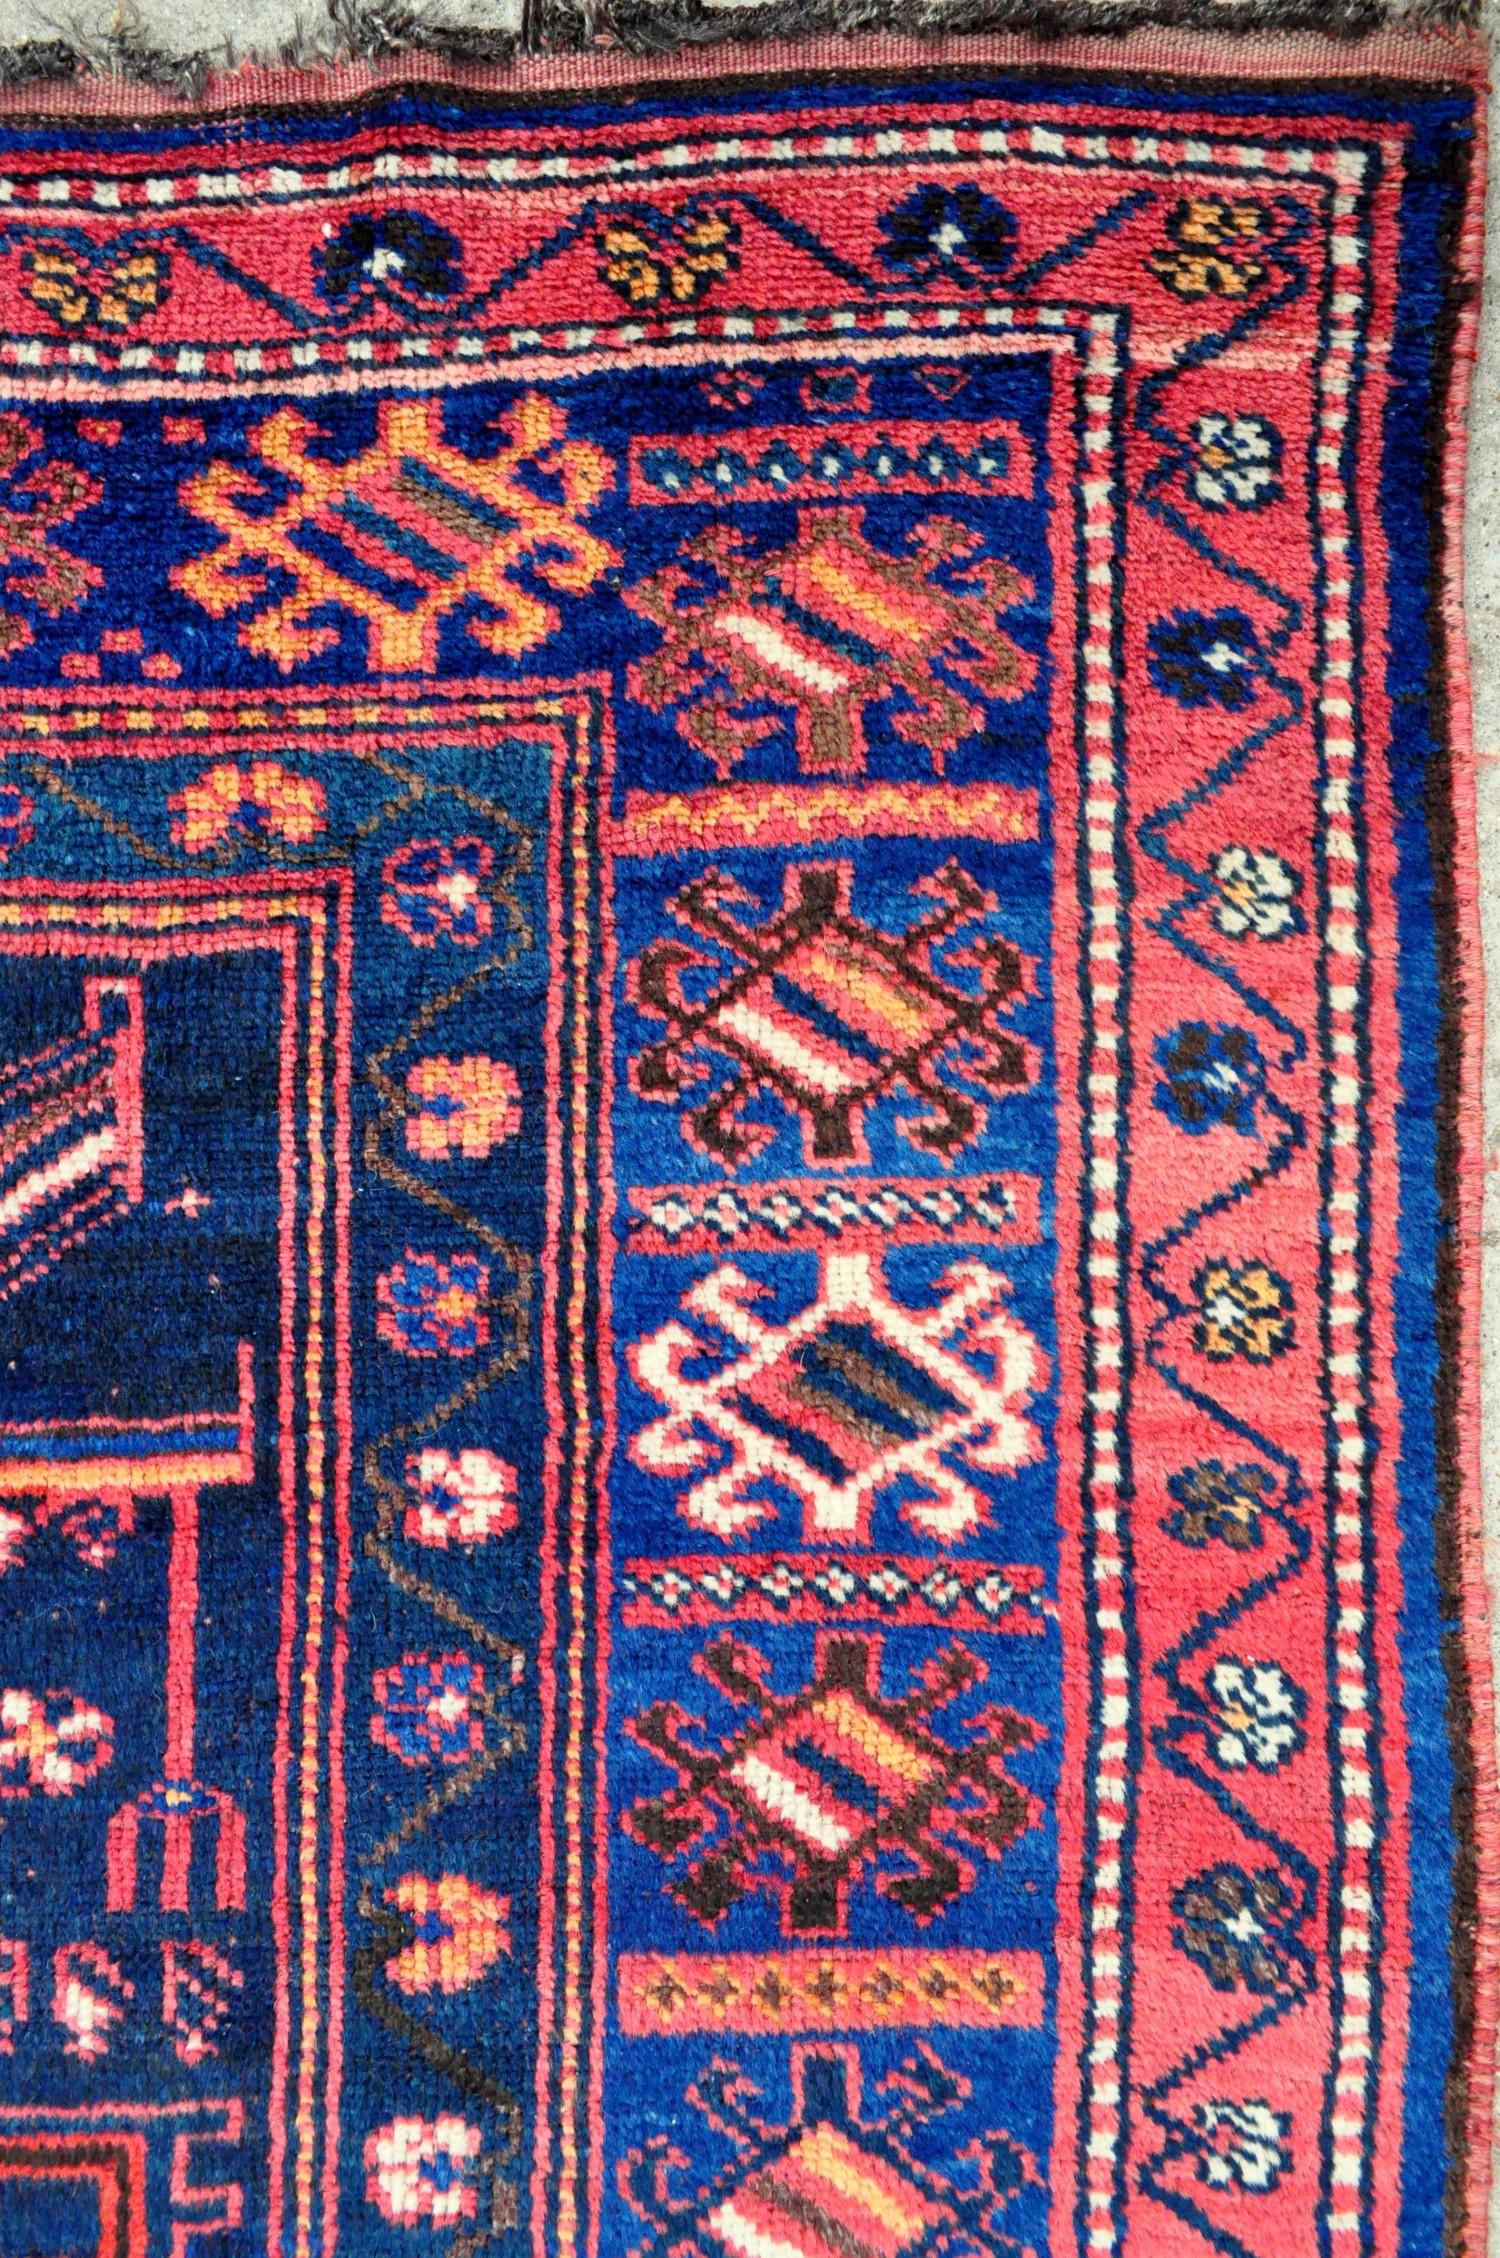 Antique Persian Tribal Luri Rug 5 2 X 10 1 158 X 307 Cm